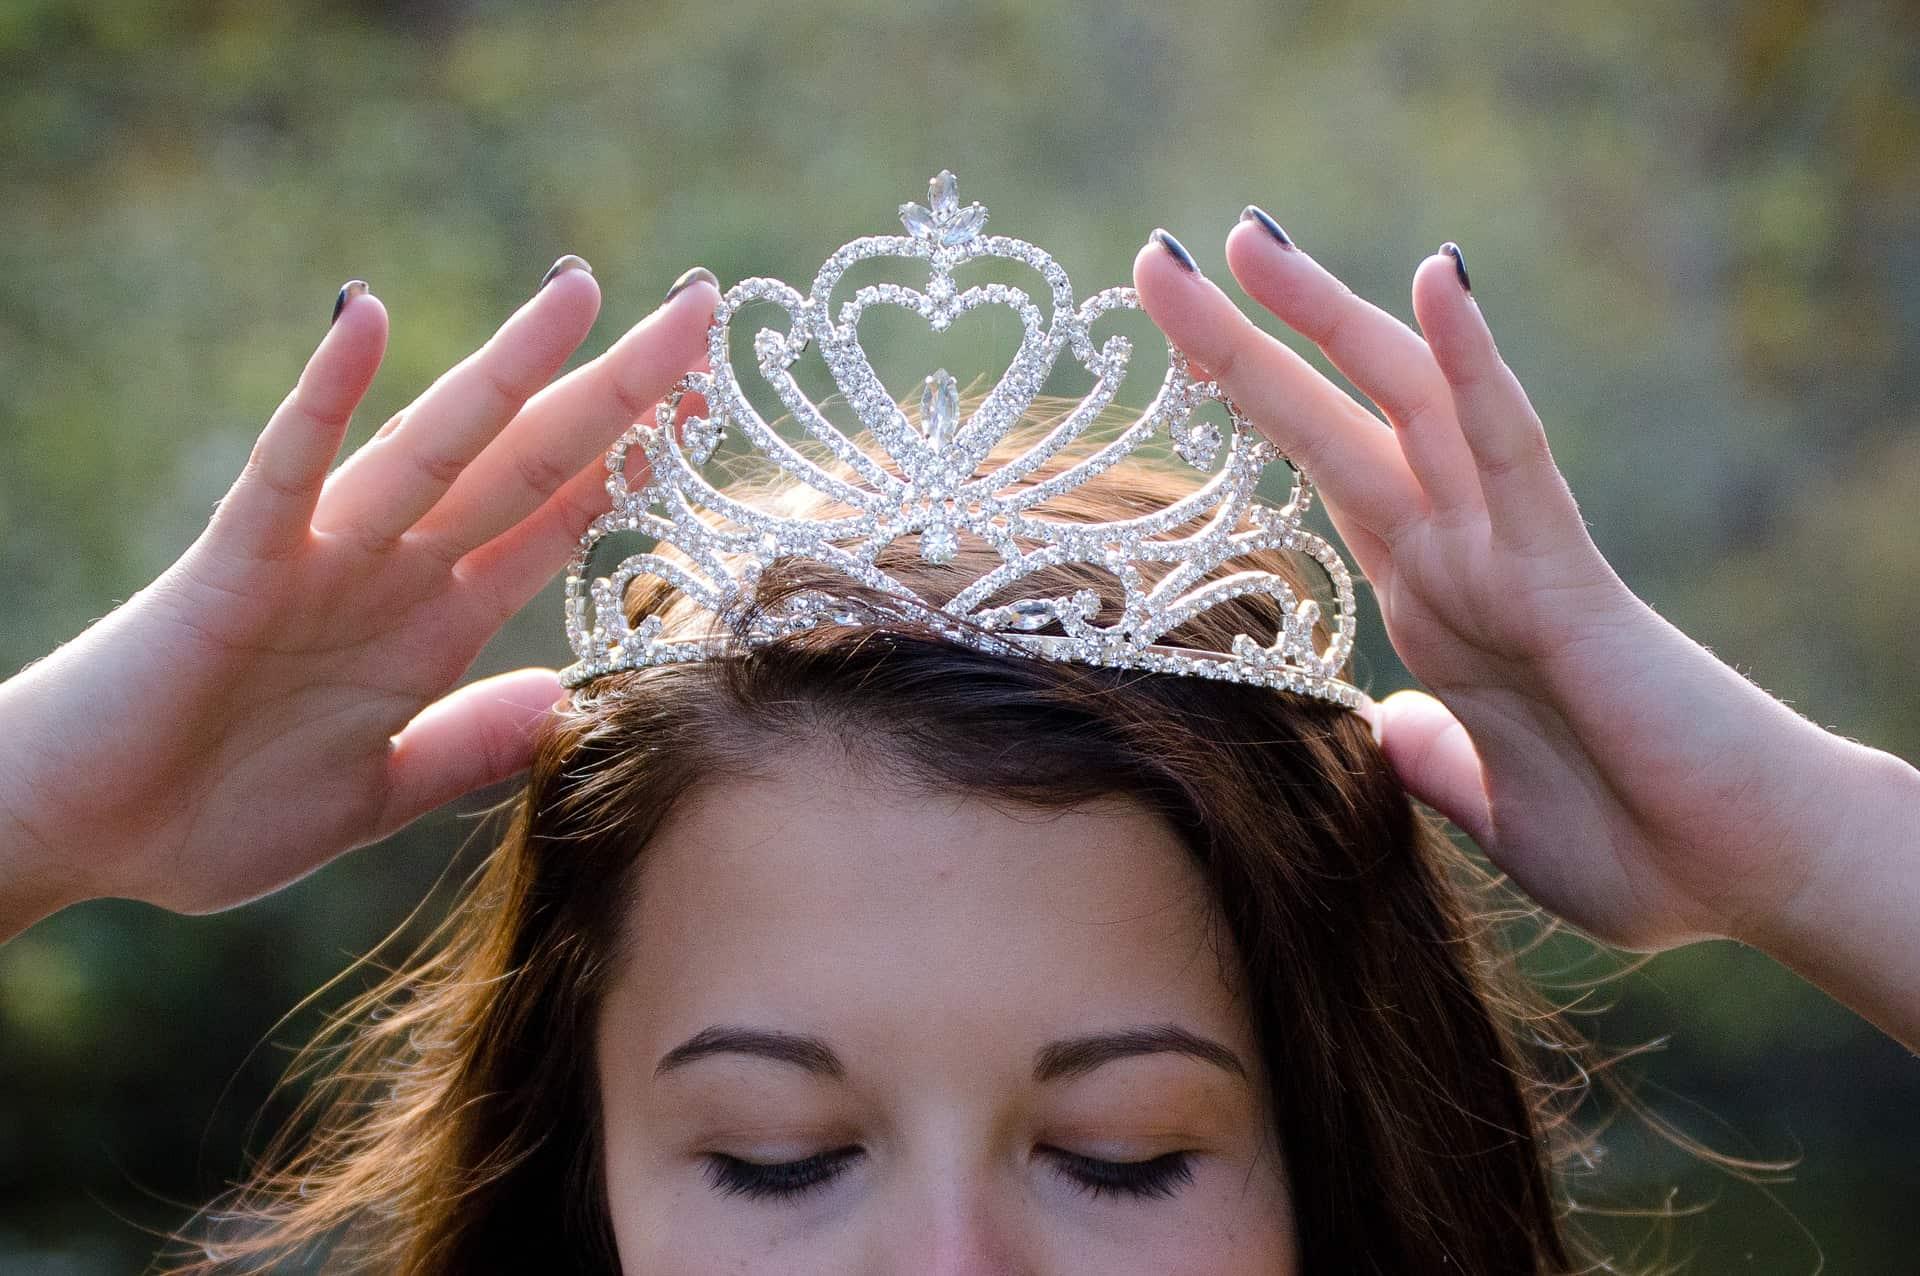 Baby Photo Shoot Birthday Gift Boy Girl Purple King Queen Diamante Tiara